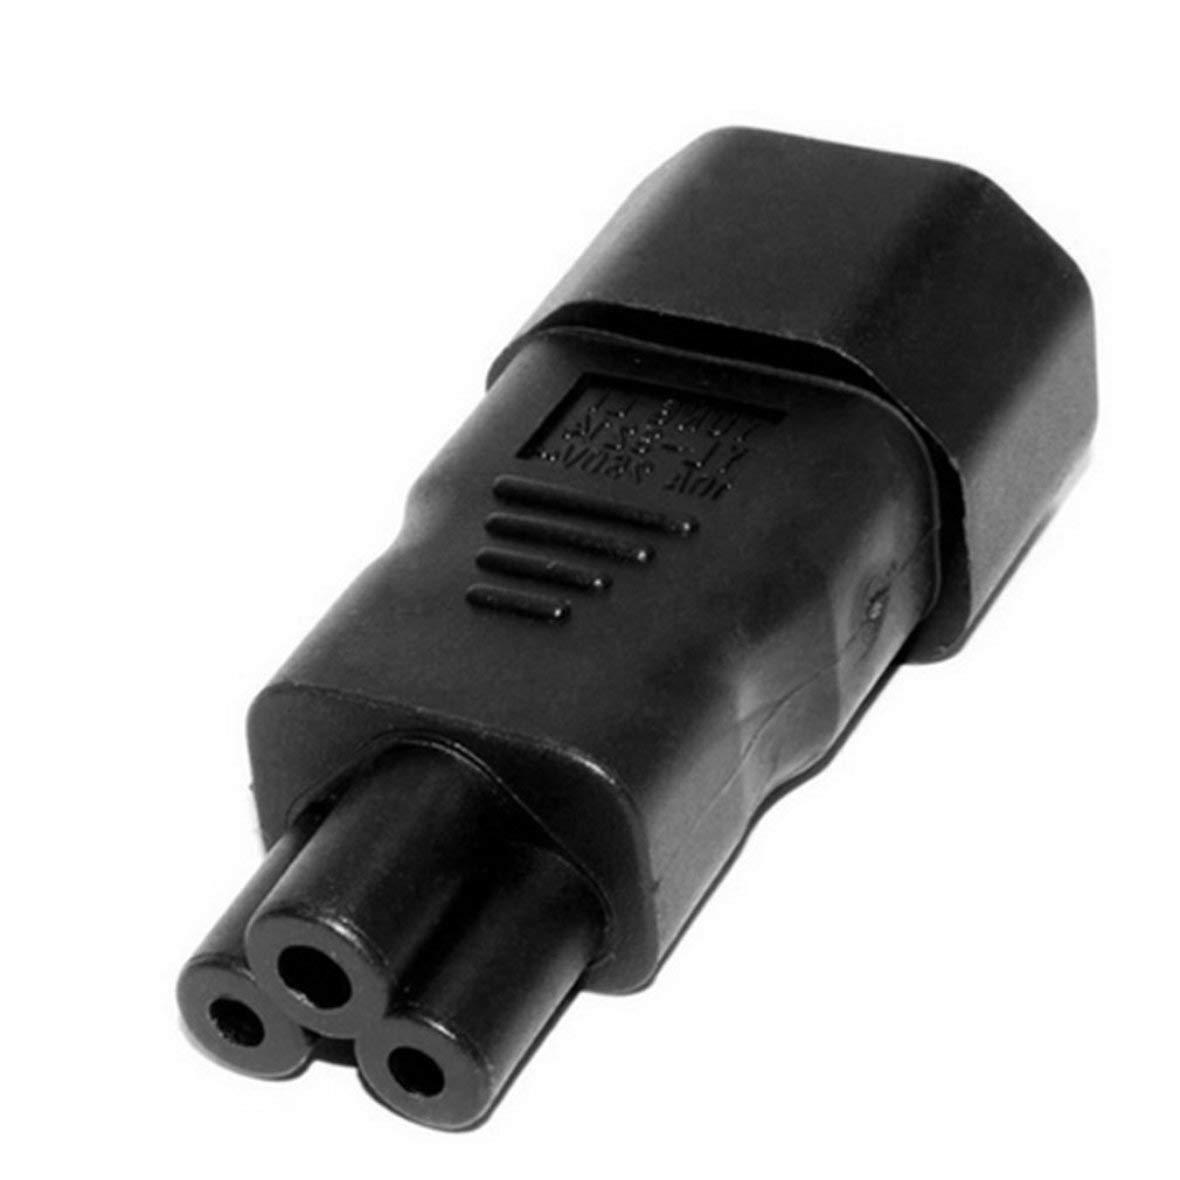 Tivolii 1pcs Plug Convertor C5 to C14 IEC320-C14 to C5 Female Power Industrial Plug Adapter ABS+Brass 10A-16A//110V-250V